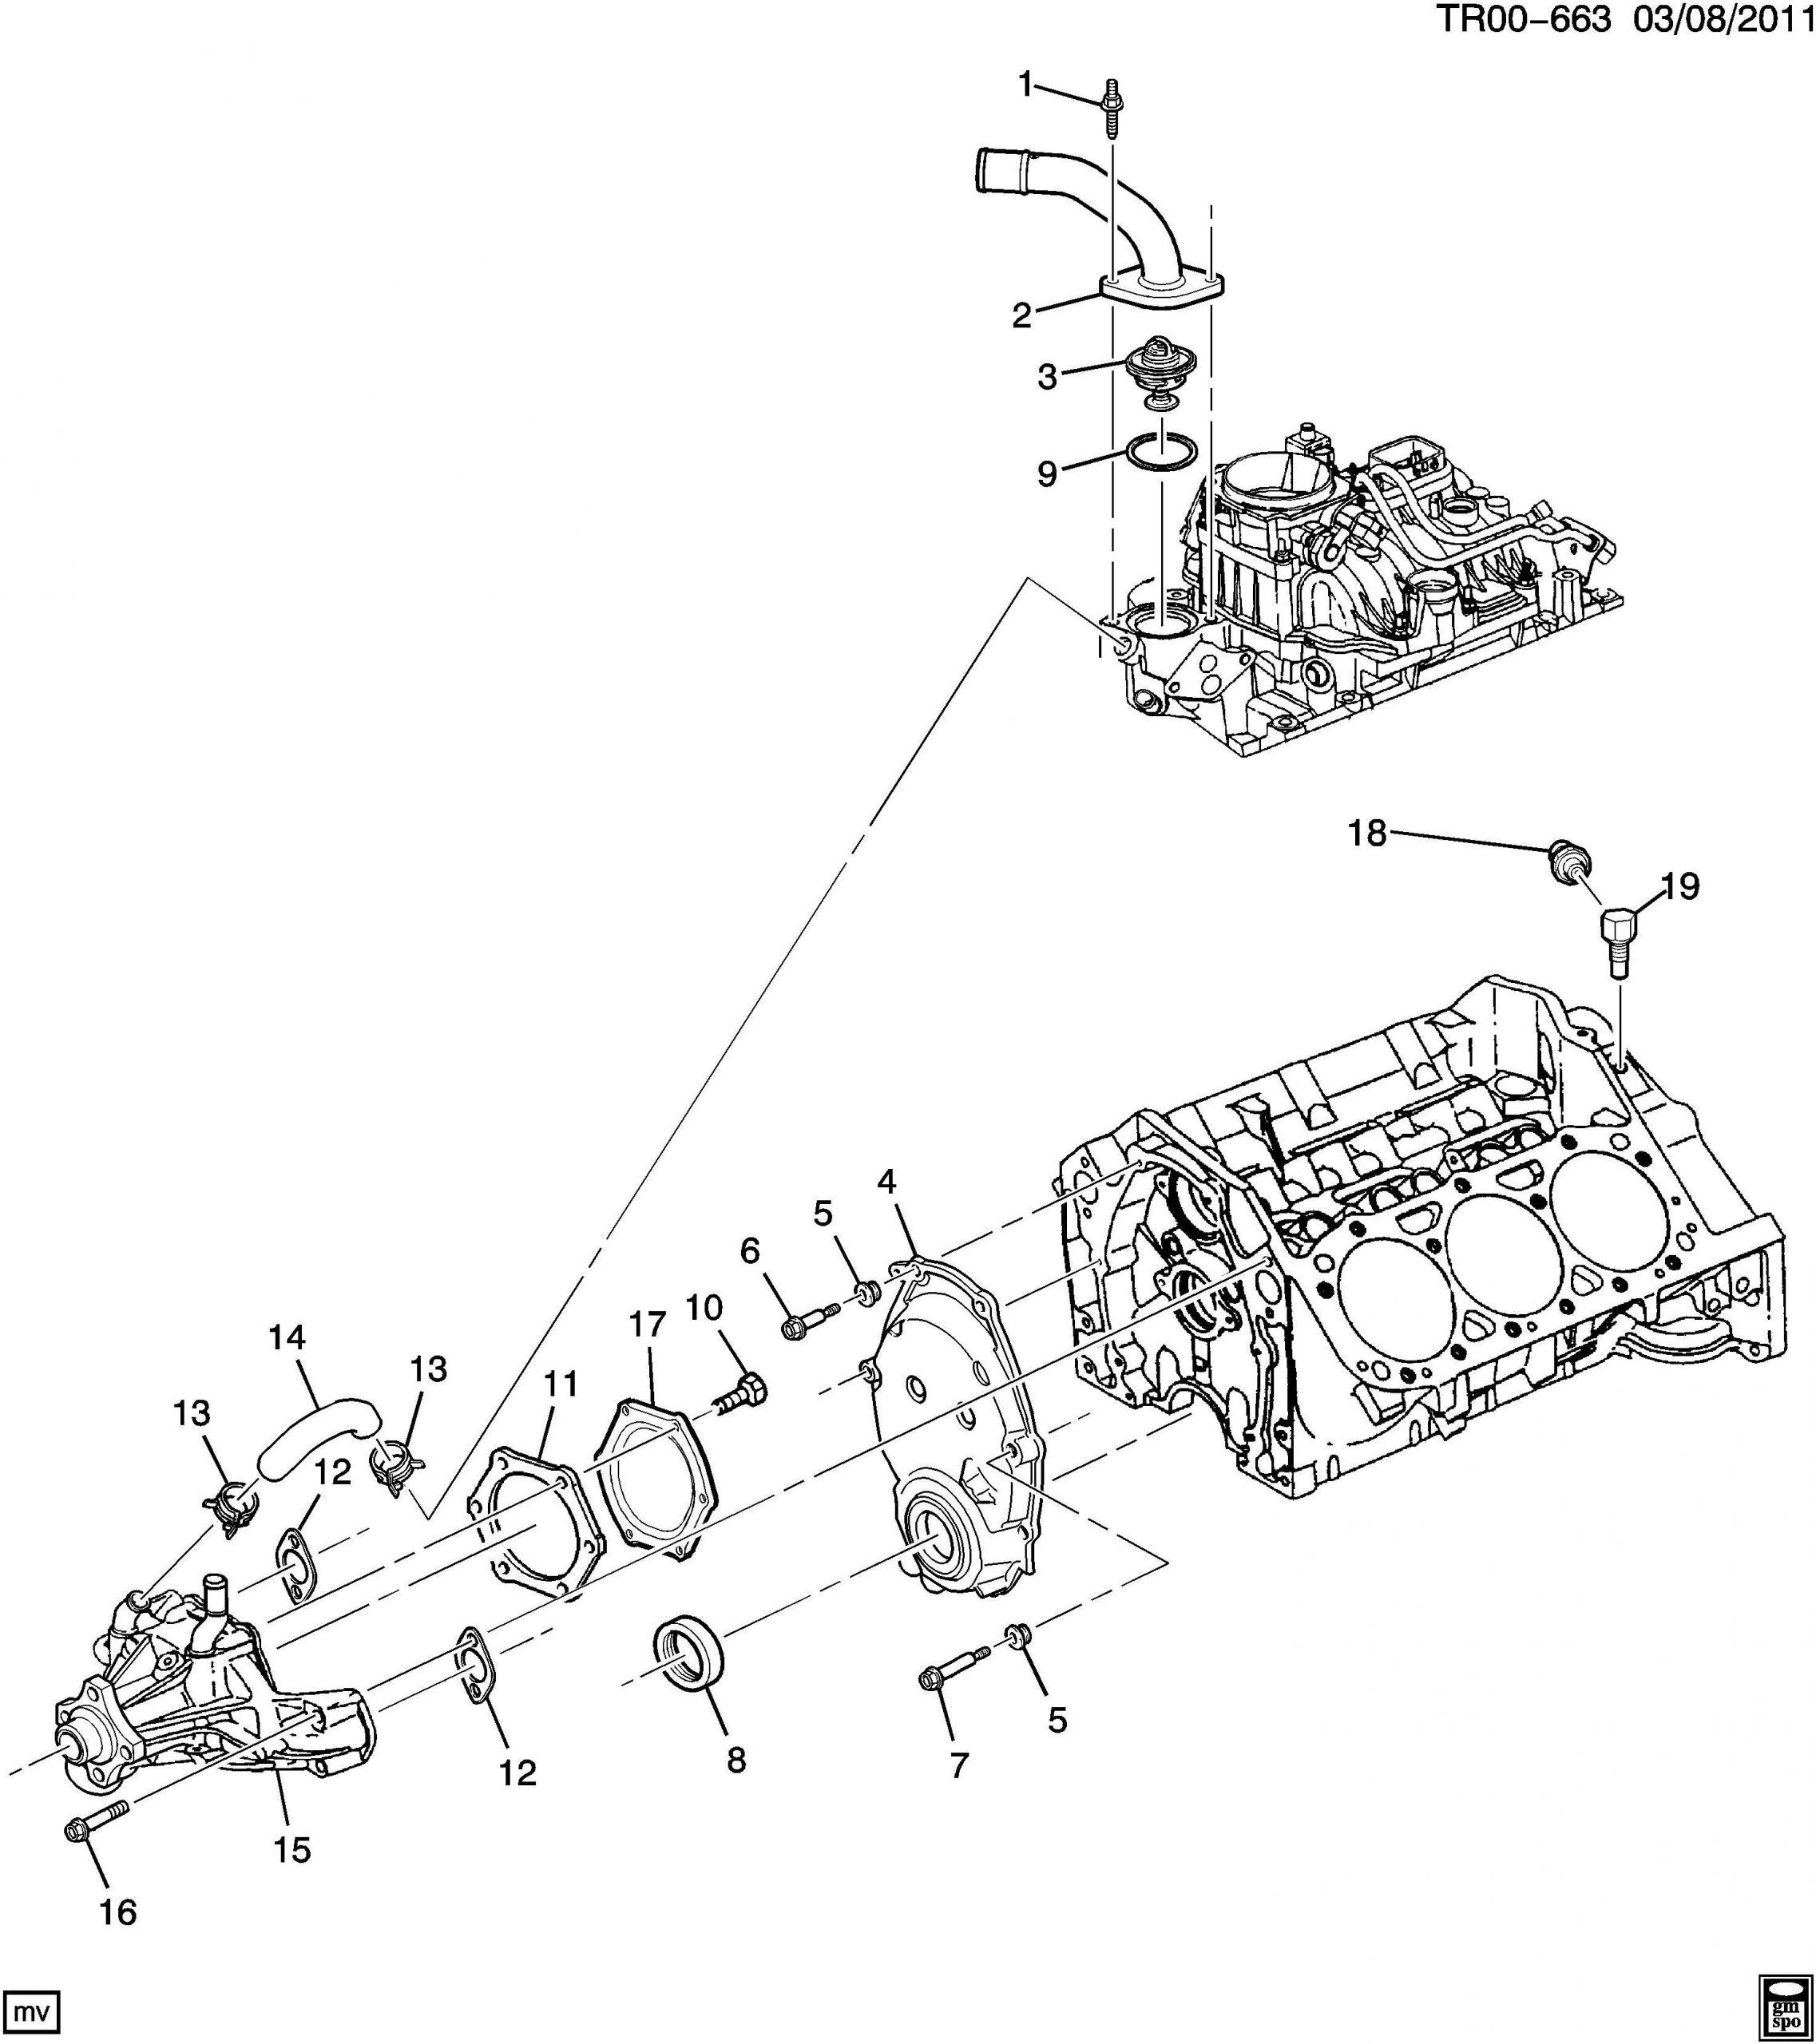 2000 Chevy 4.3 Engine Diagram 2000 Chevrolet S10 Bolt Engine Front Cover Bolt Eng Frt Cvr 1 4 20x 025 Hwh Of 2000 Chevy 4.3 Engine Diagram